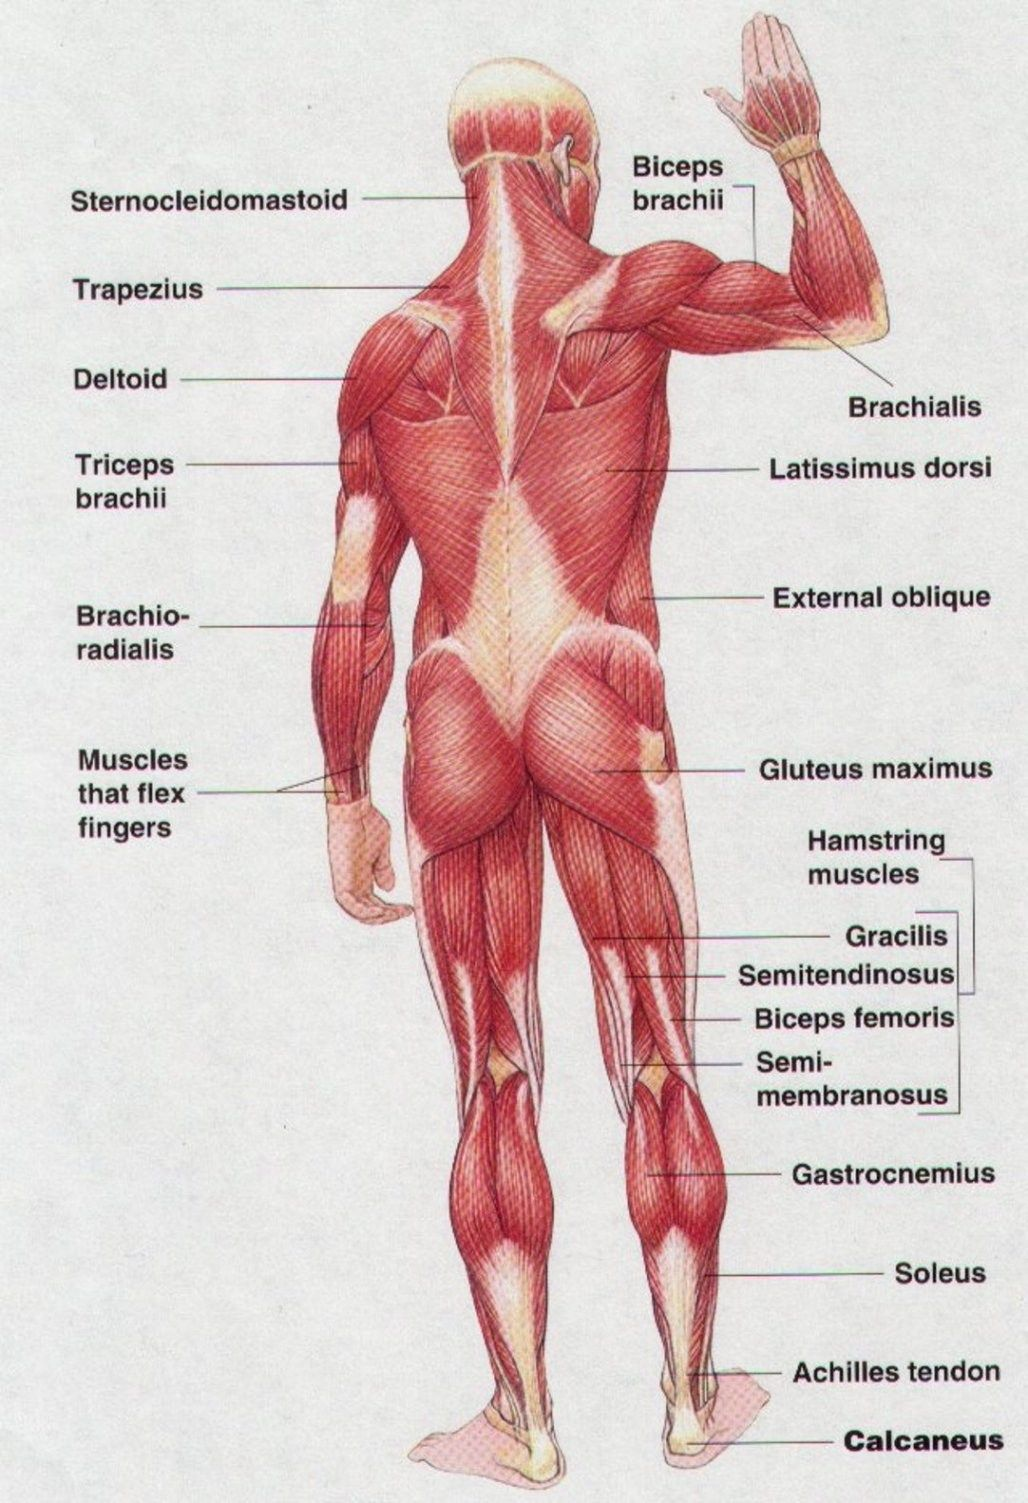 Human Back Muscle Diagram Koibana Info Muscle Anatomy Muscle Diagram Muscle